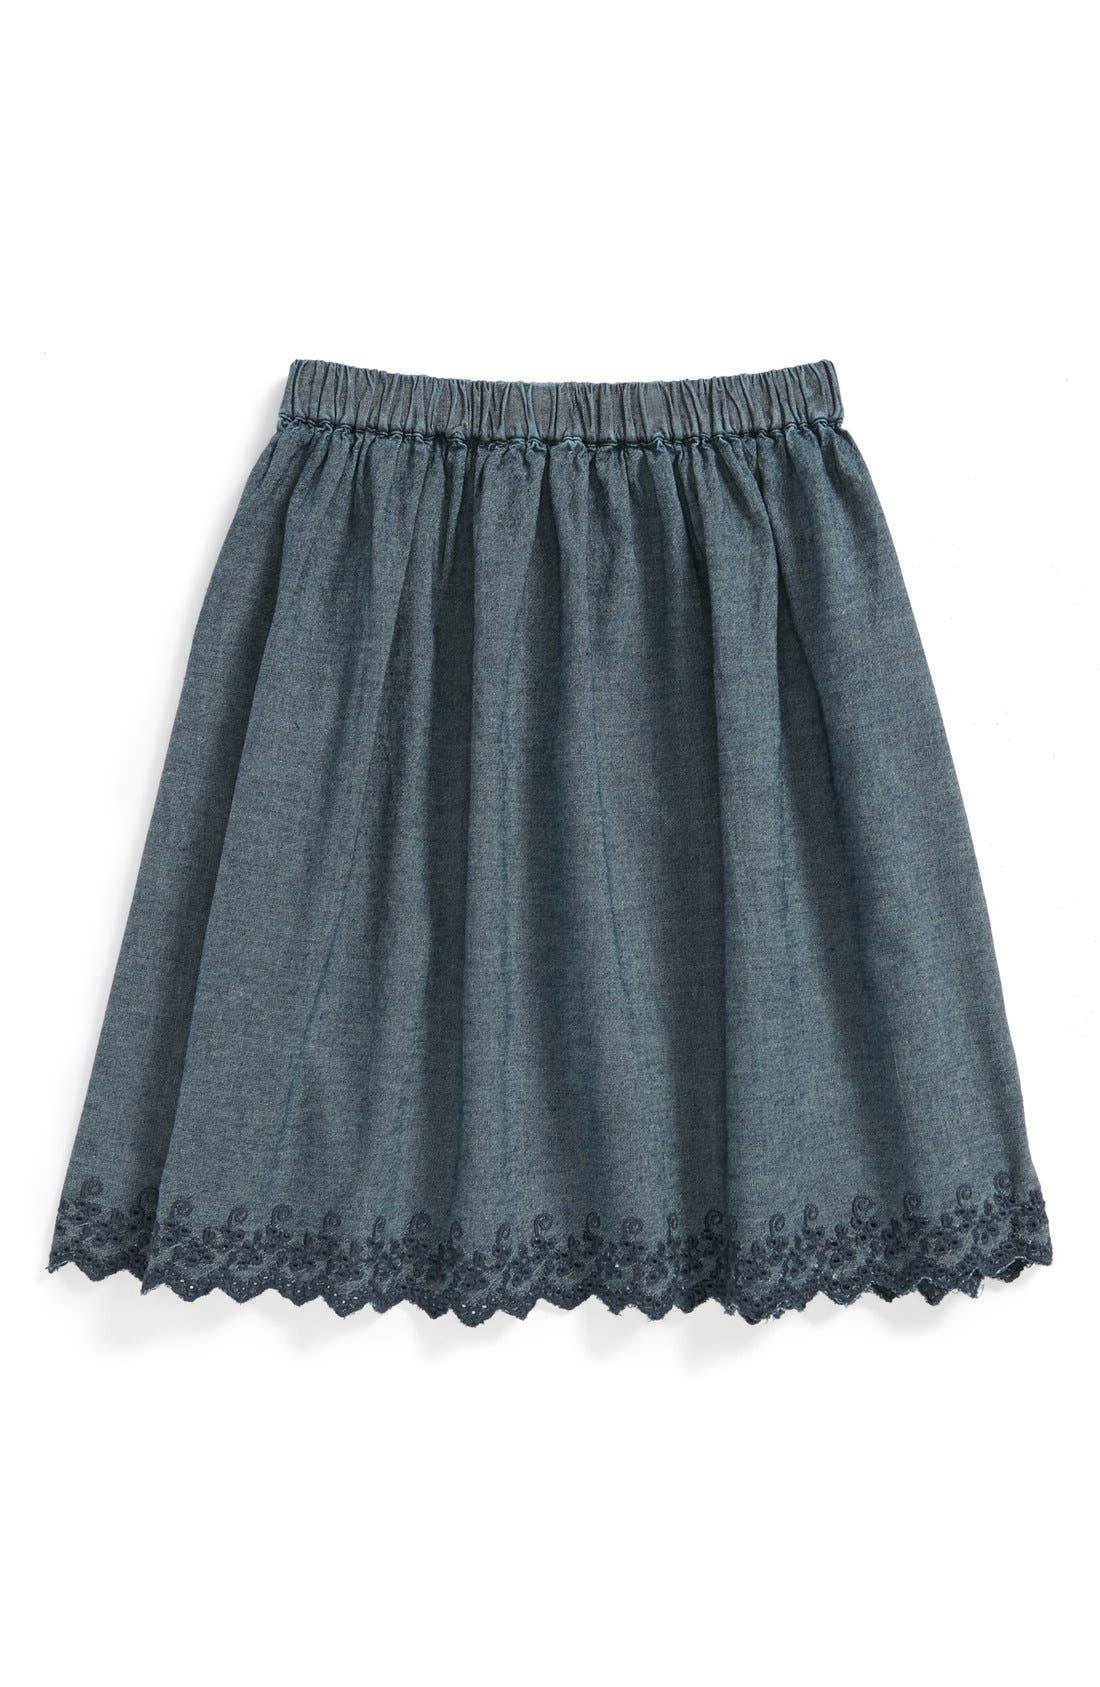 Main Image - Peek 'Harlow' Skirt (Toddler Girls, Little Girls & Big Girls)